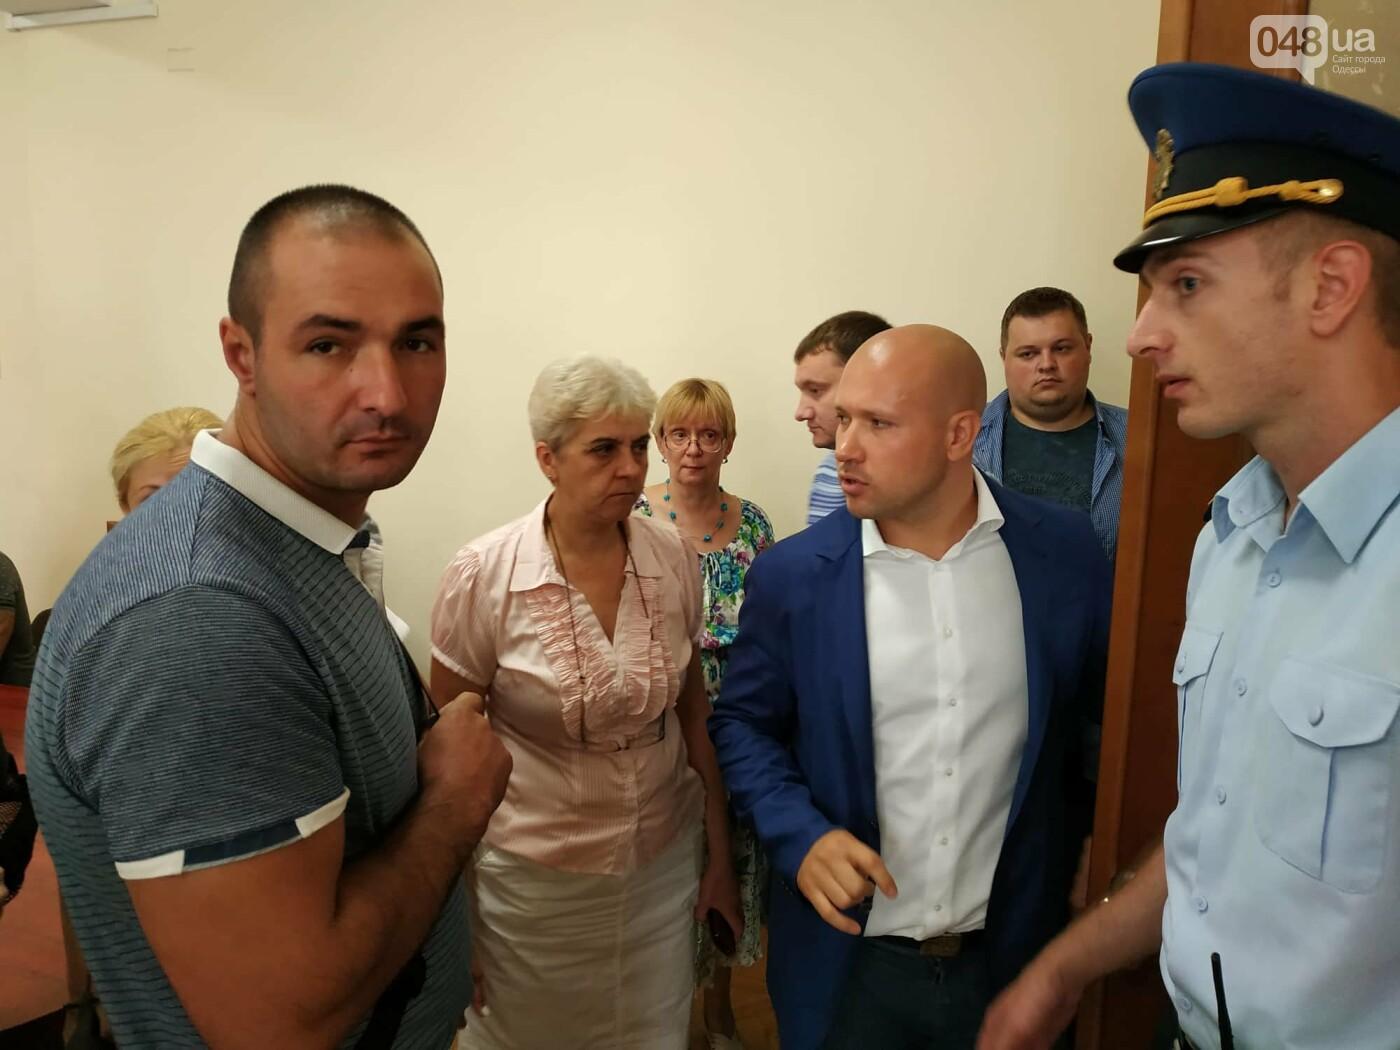 Стало известно, кто возглавил Одесский областной совет, - ФОТО, фото-13, Фото: Александр Жирносенко